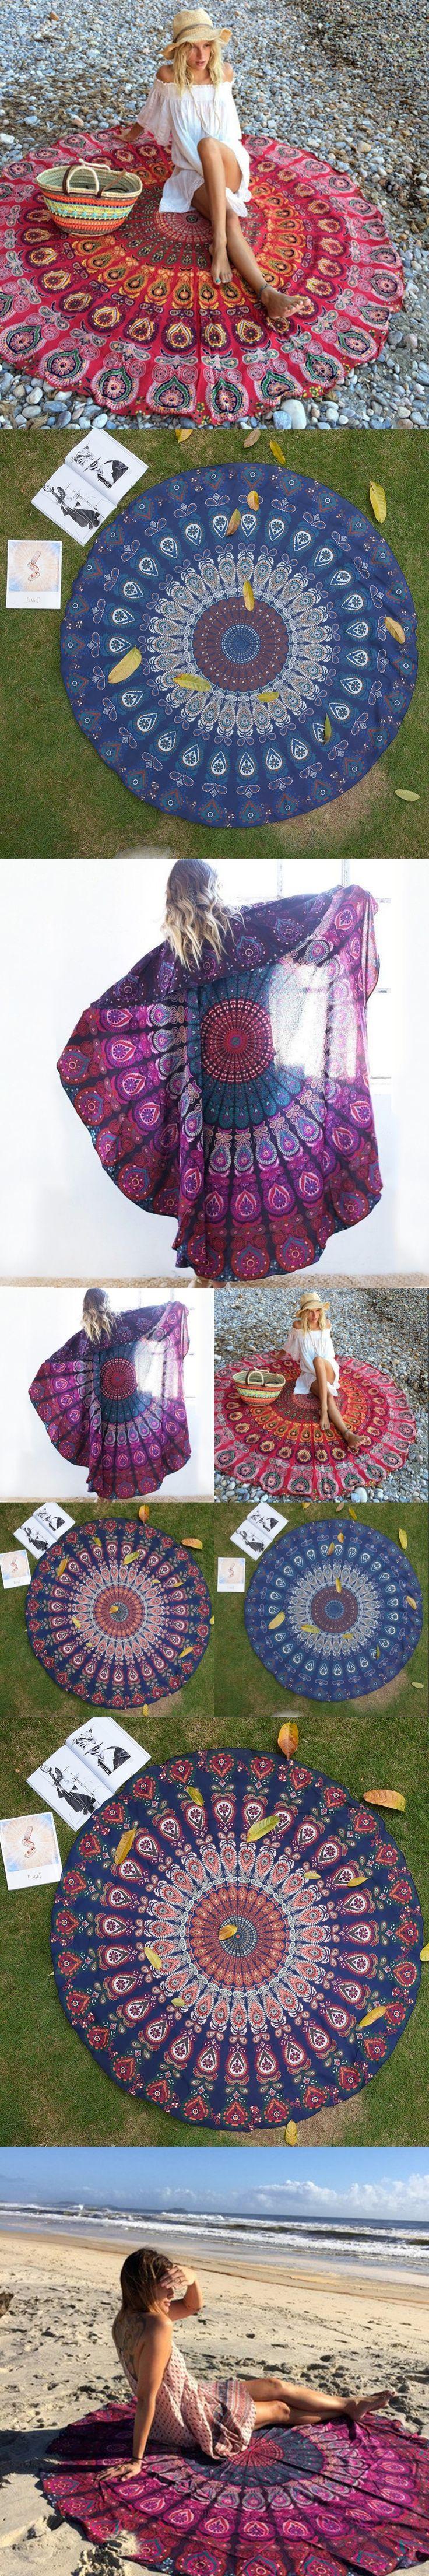 Chiffon round shawl wrapped skirt yoga mat beach towel shawl beach mat wall Anti-sunburn saida de praia suooprt wholesale